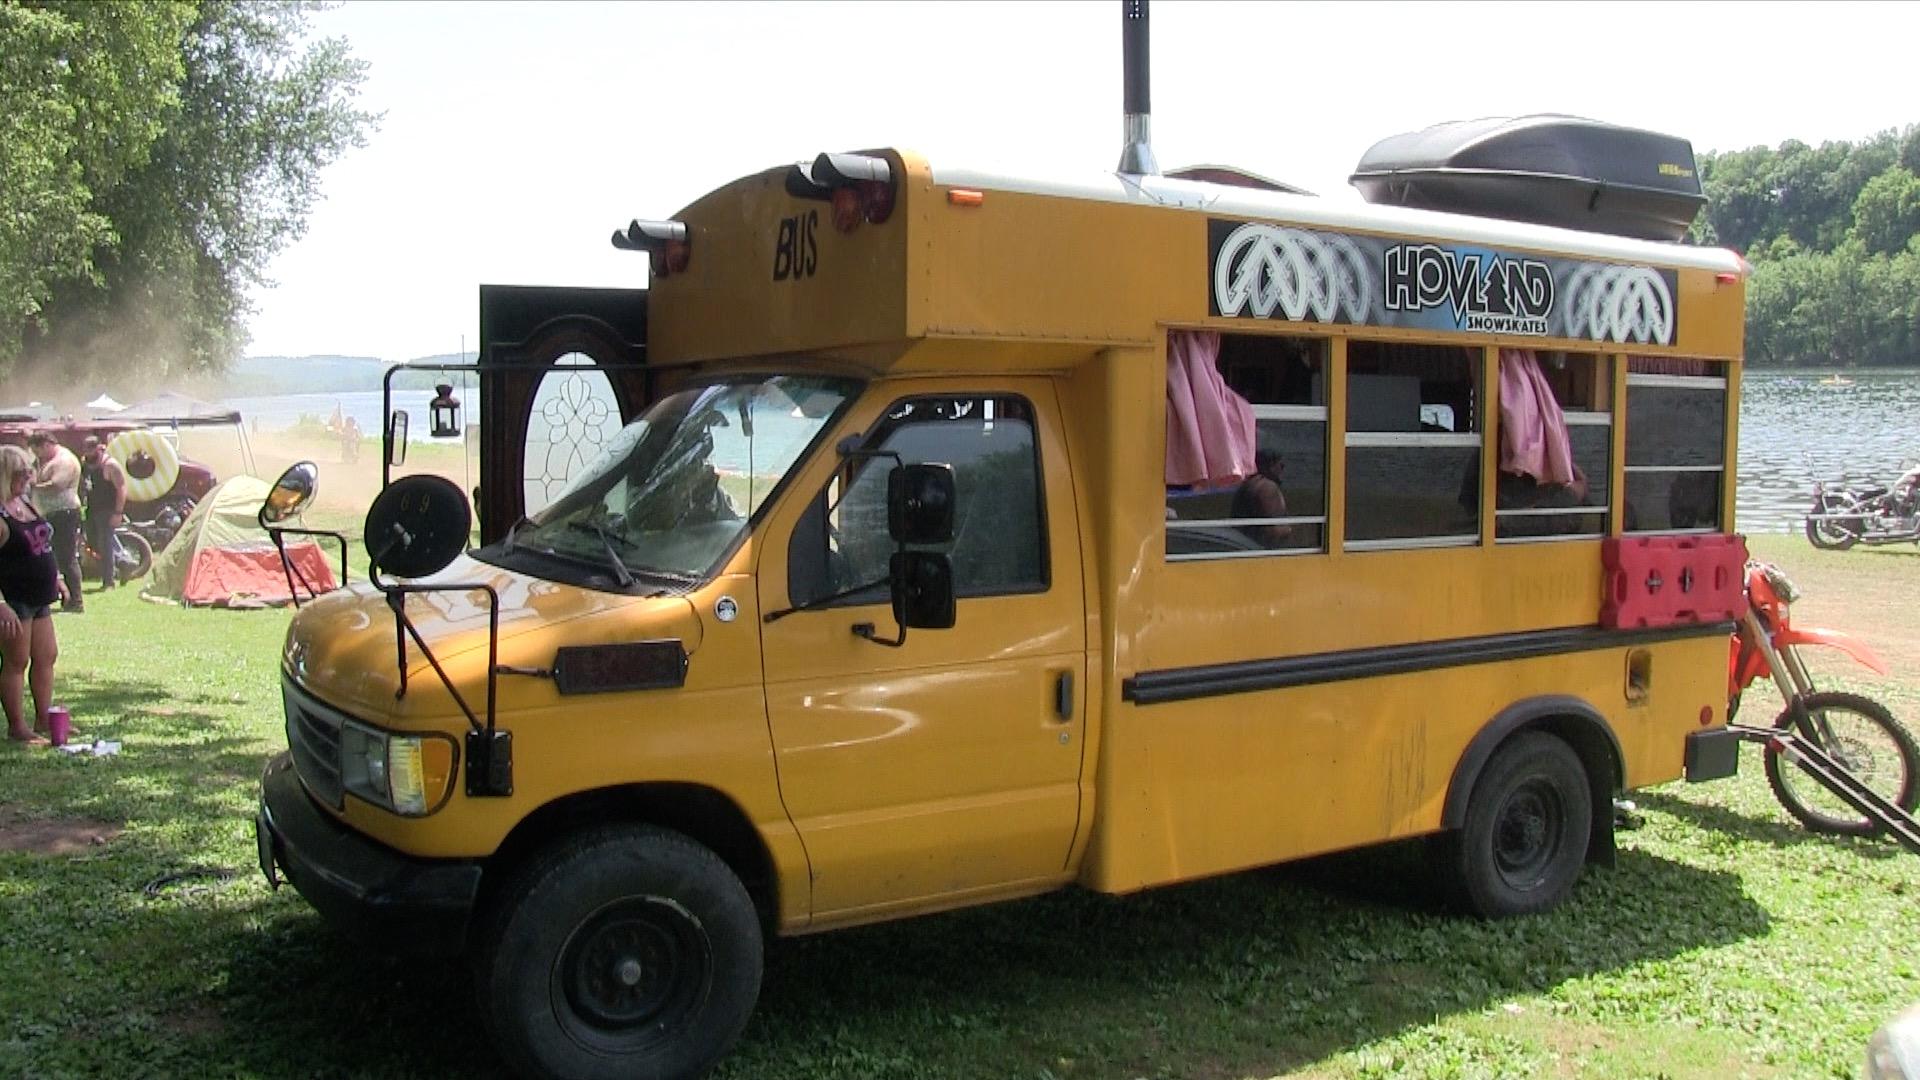 Ben Schimer's Cool Bus